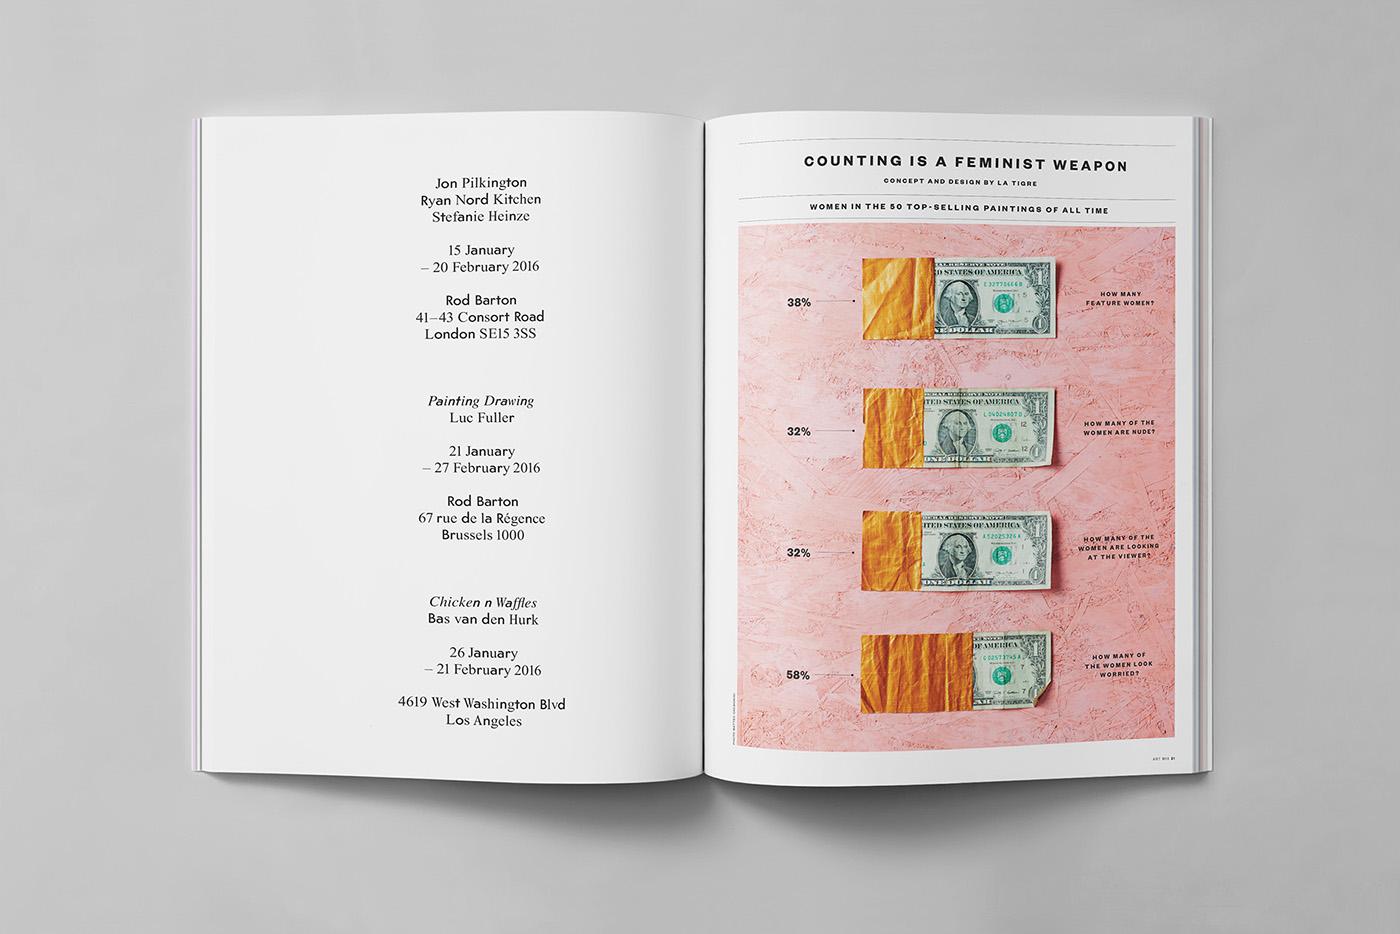 Creatve Print Data Viz (Infographics), by Atlas for Elephant Magazine